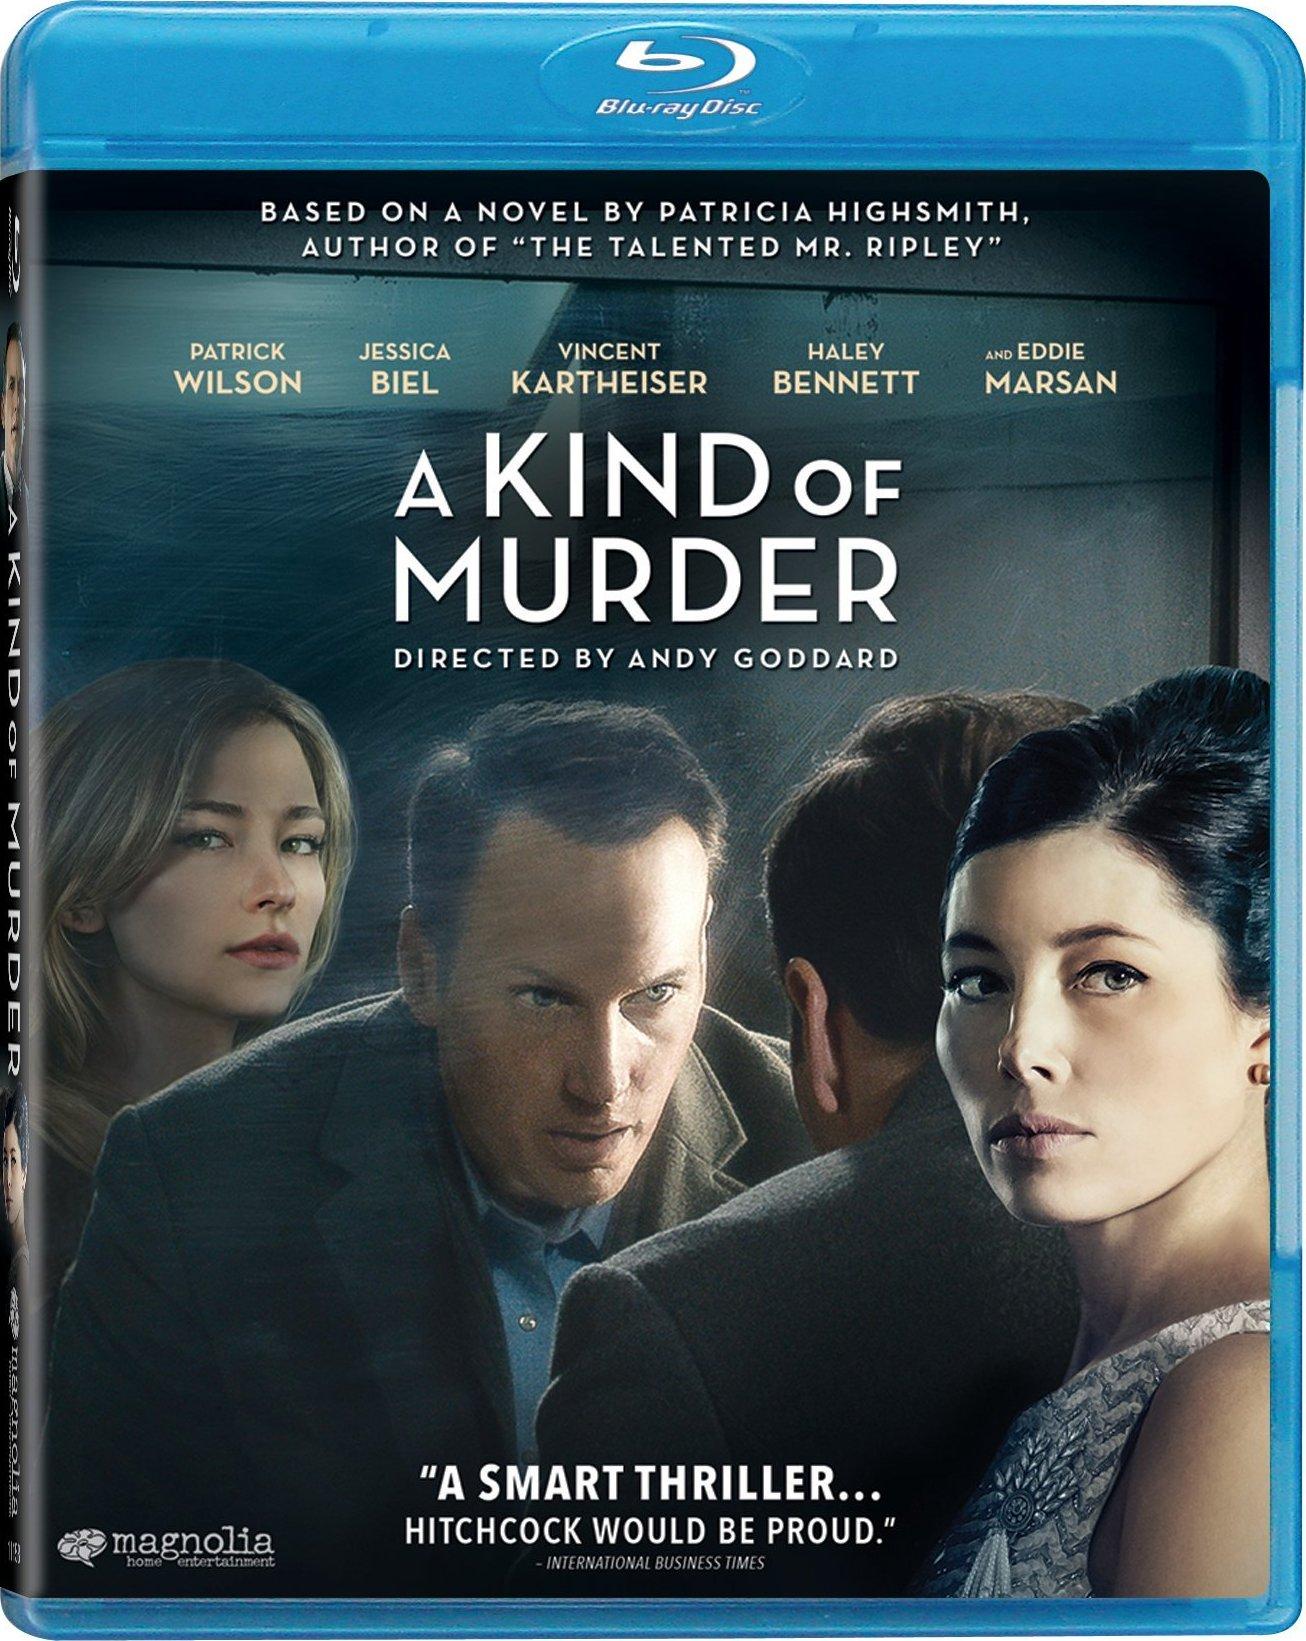 A Kind of Murder (2016) poster image